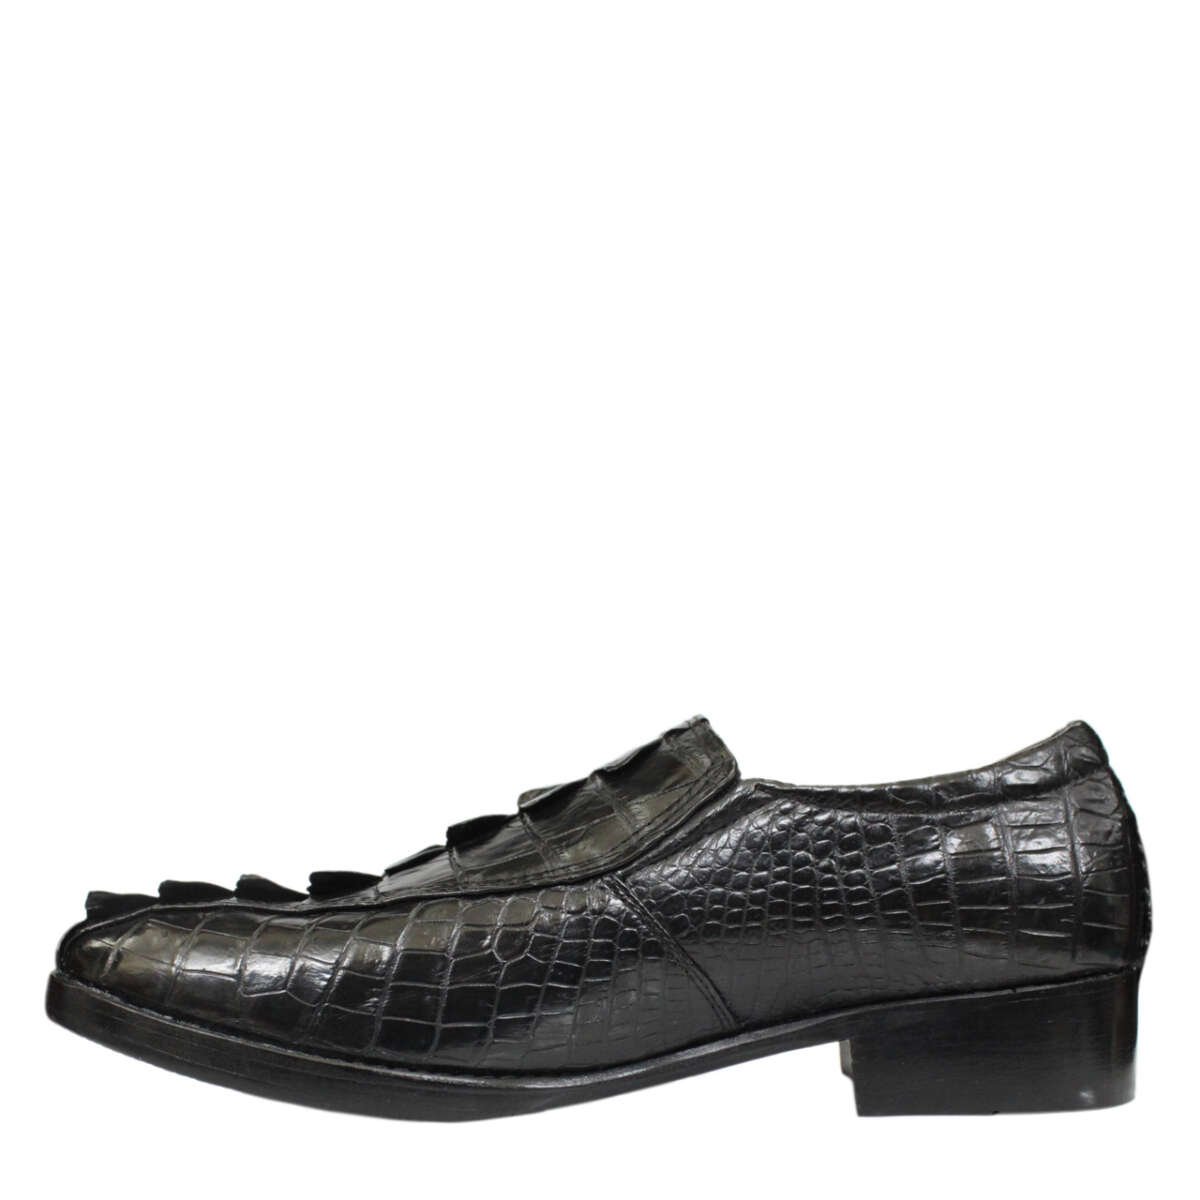 Giày nam da cá sấu S858a